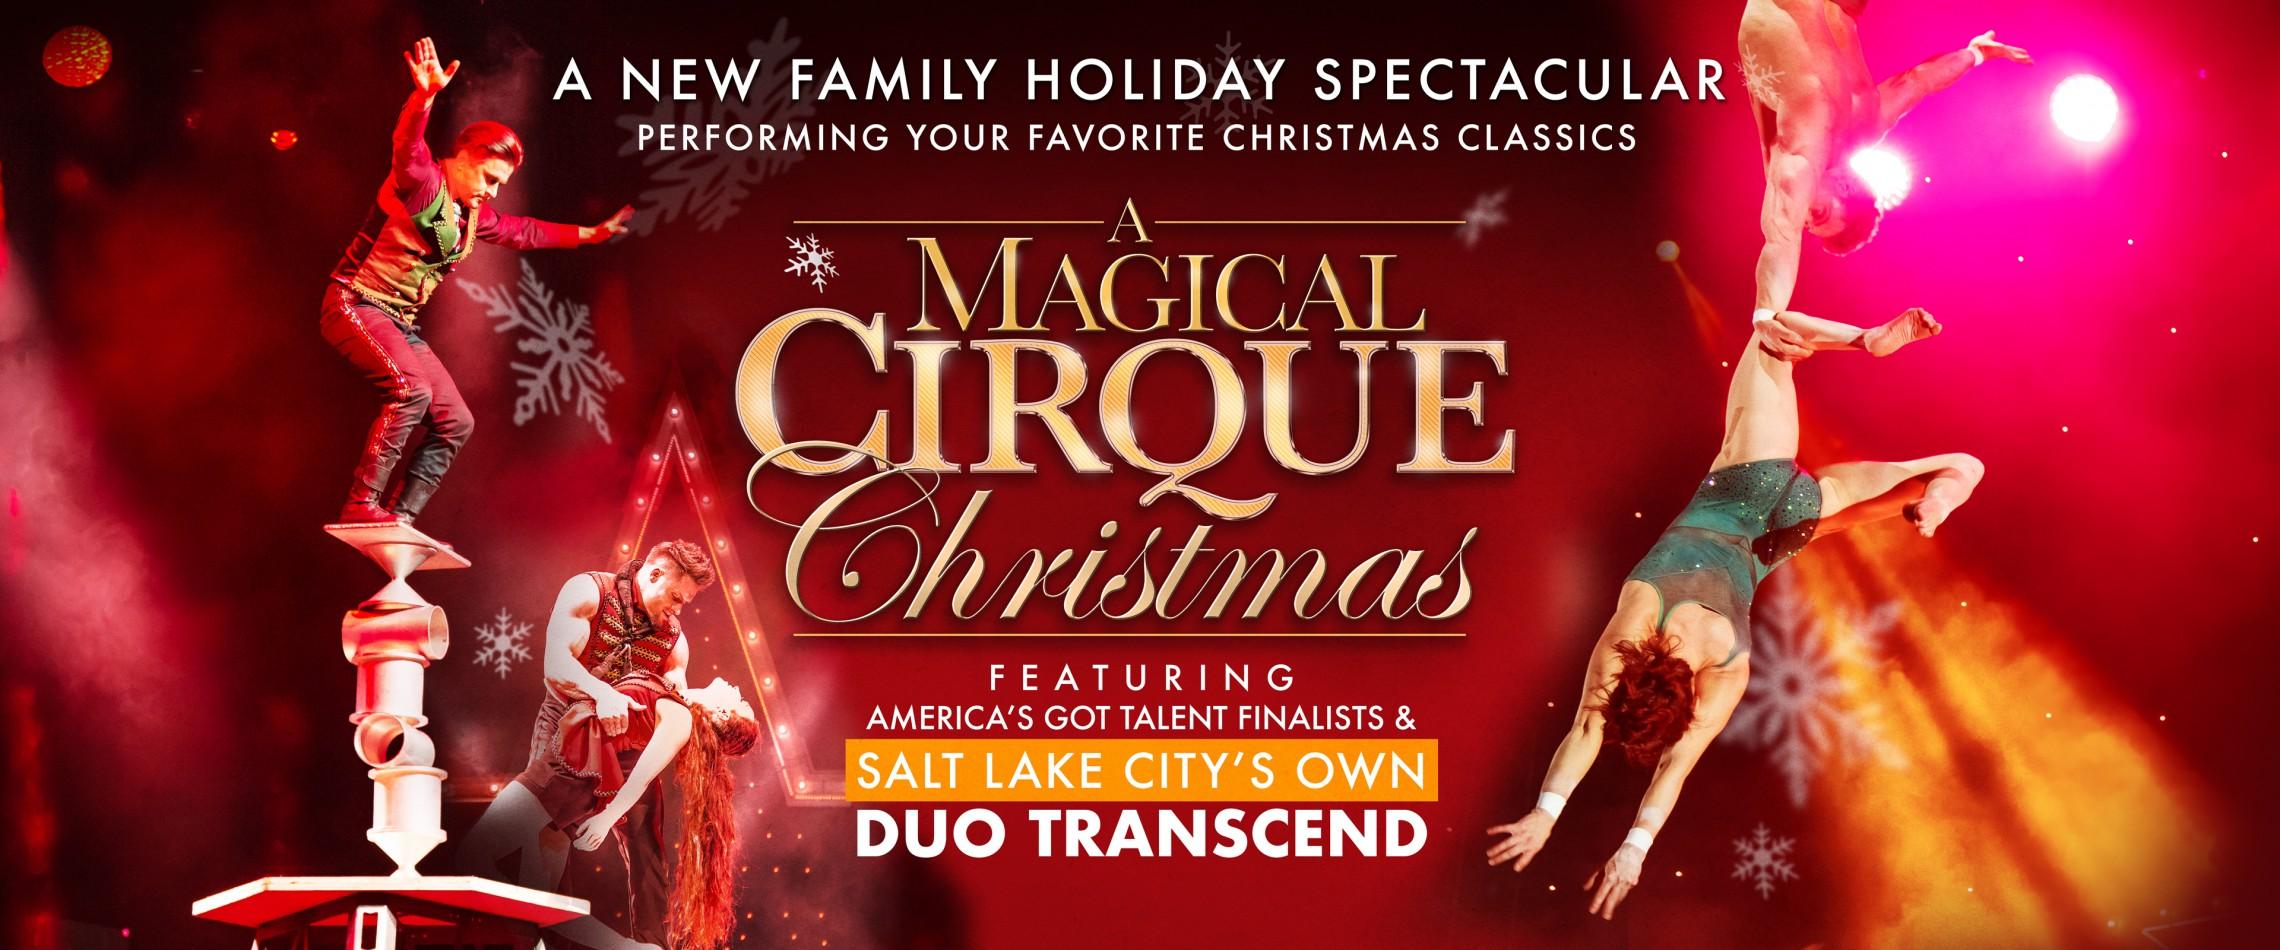 A Magical Cirque Christmas.A Magical Cirque Christmas Live At The Eccles